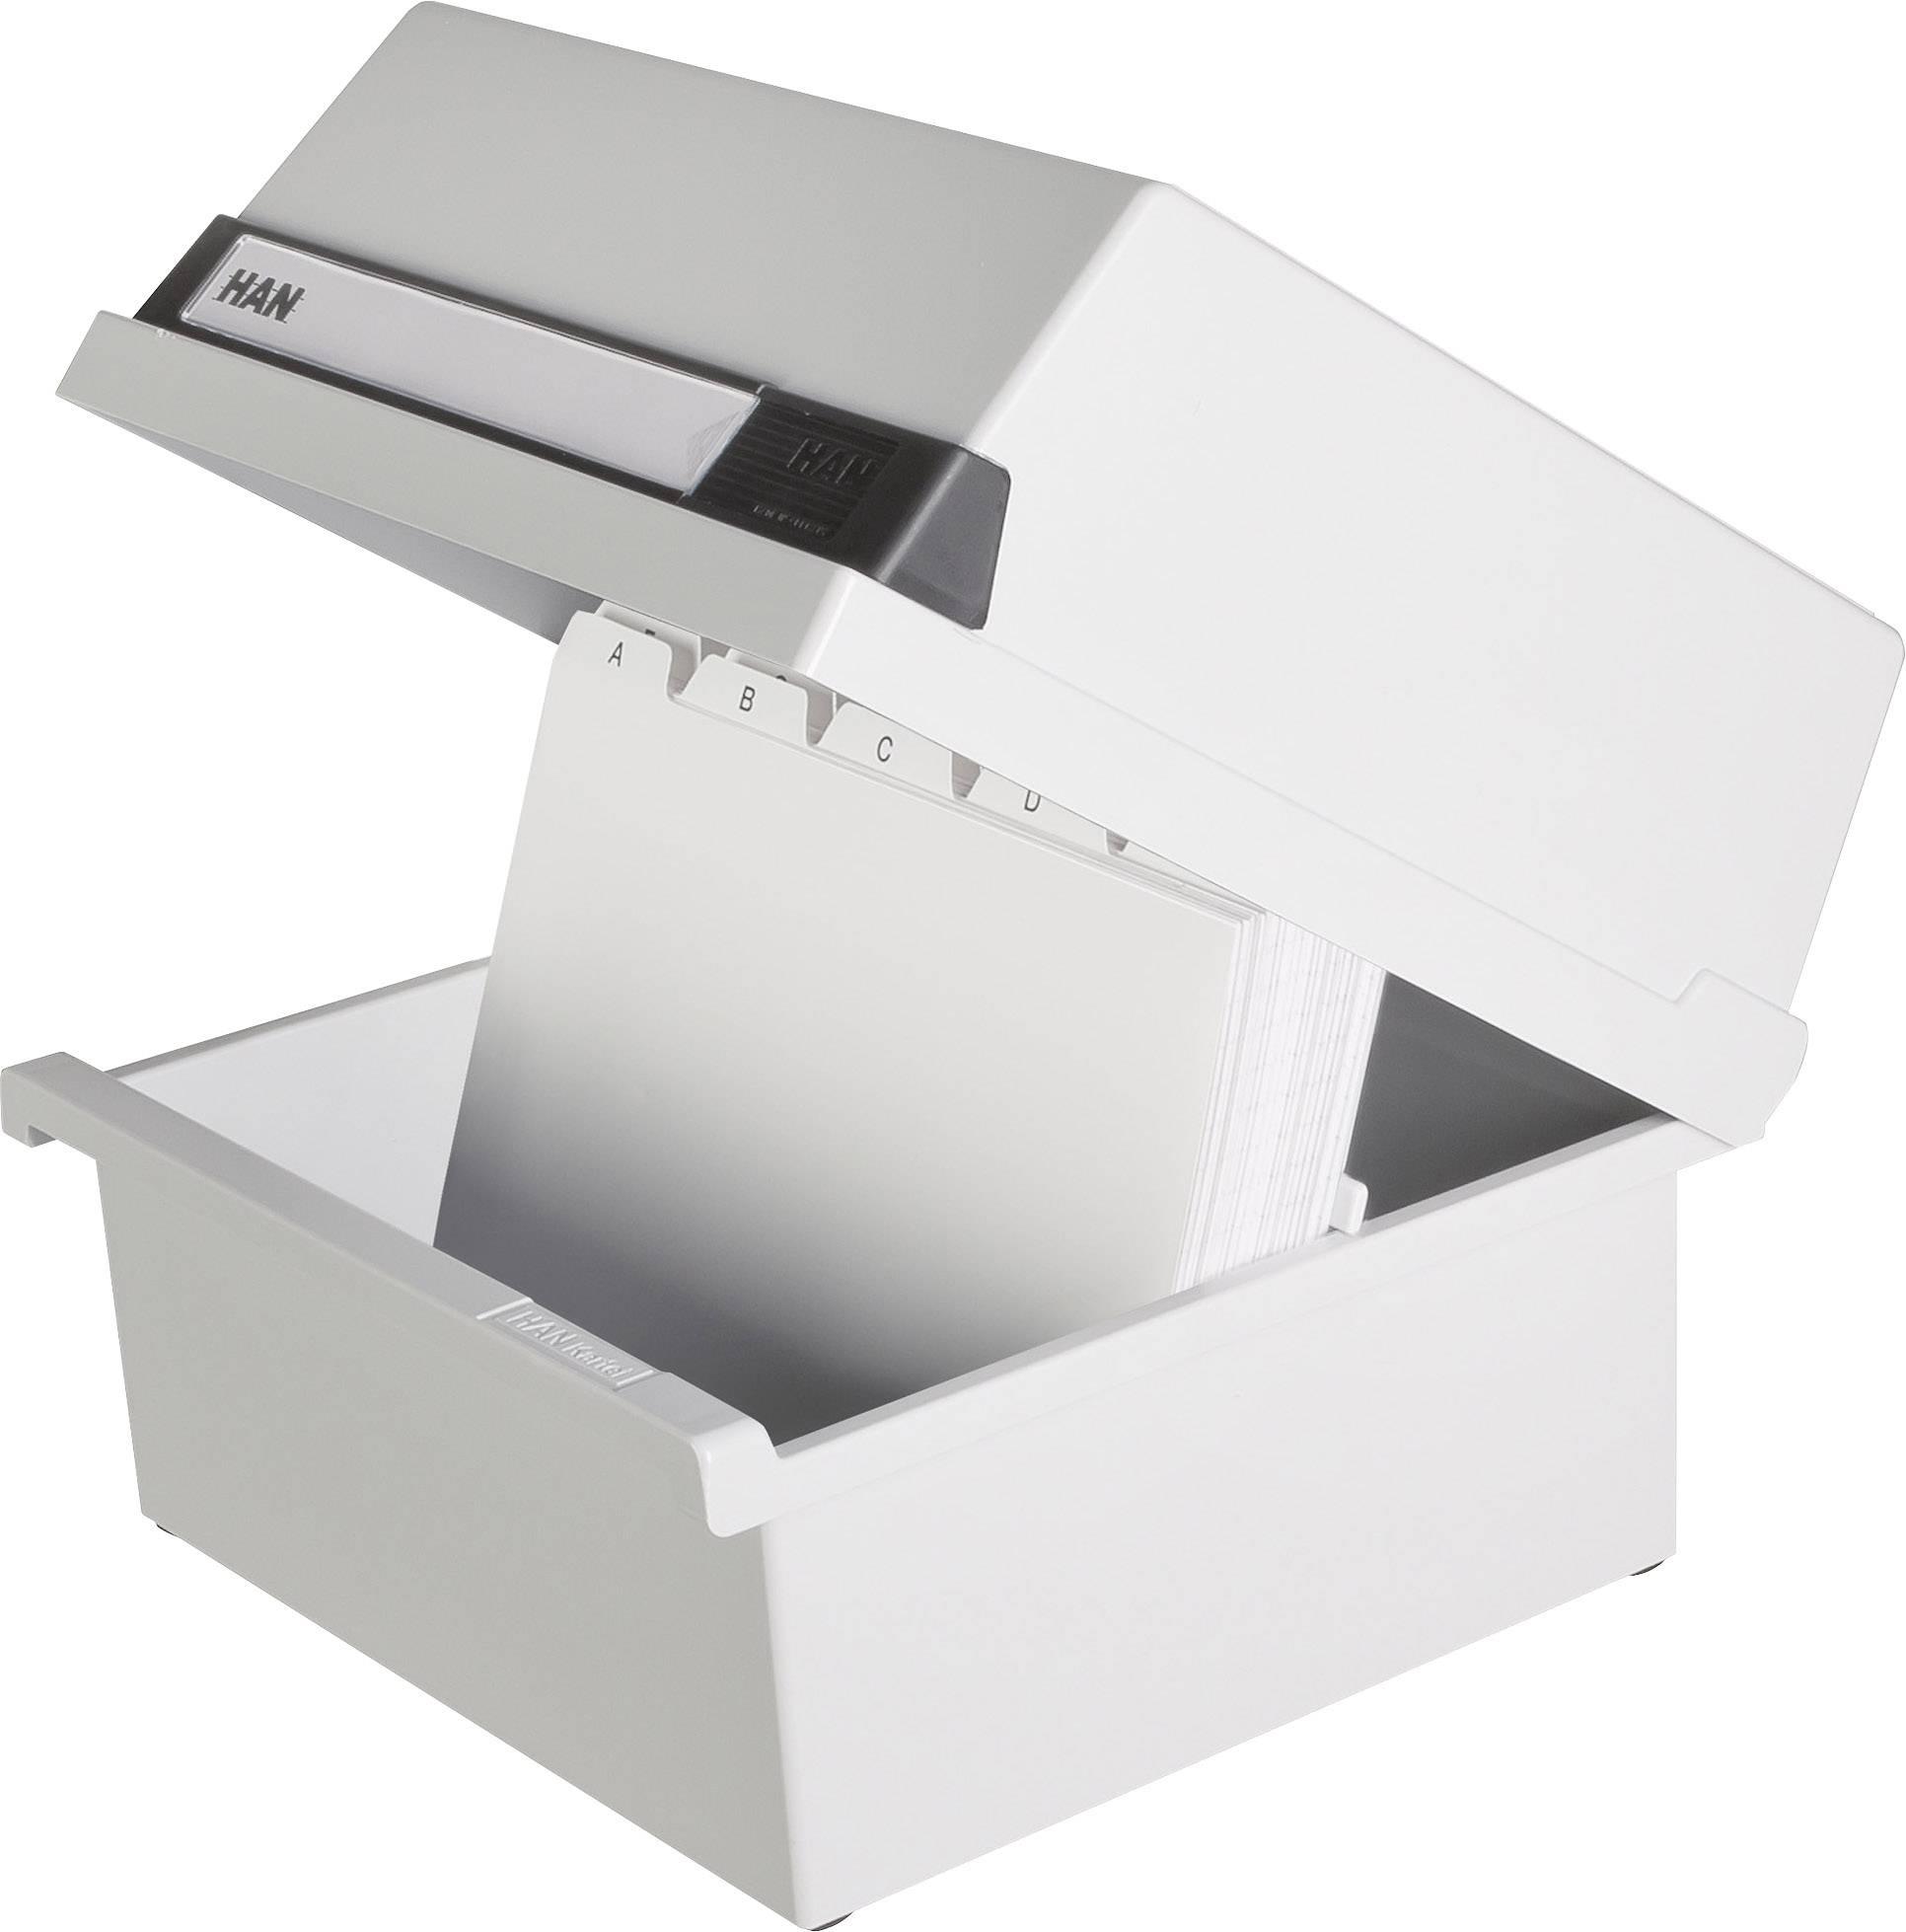 HAN Škatla za 800 indeksnih kartic/965-11 A5 horizontalen svetlo siva, plastika